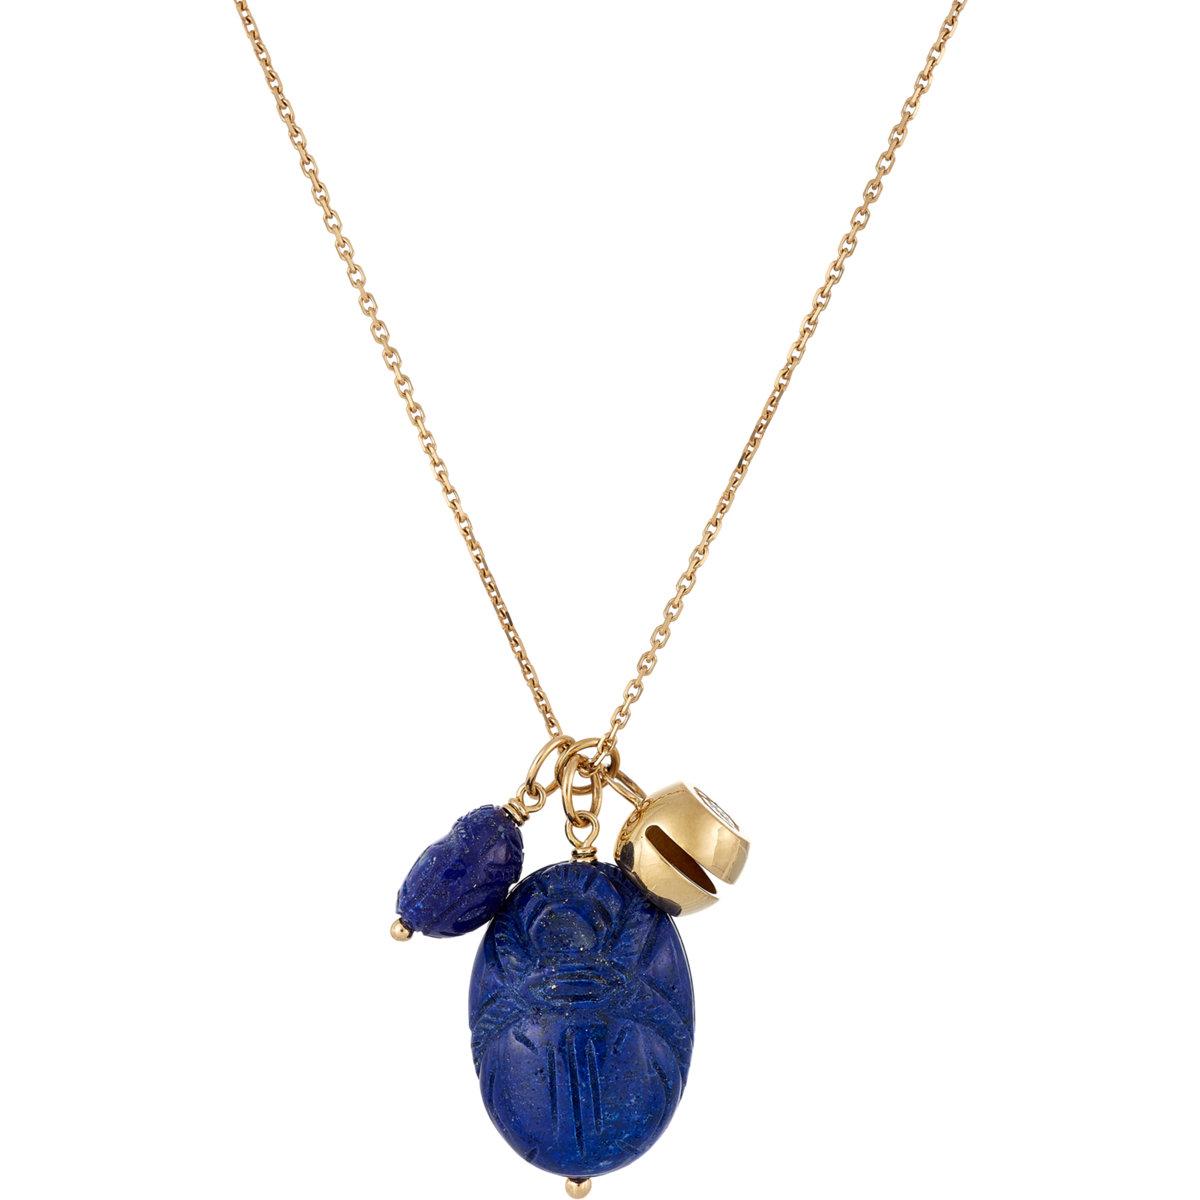 Aurelie Bidermann Carved Scarab Amp Bell Pendant Necklace In